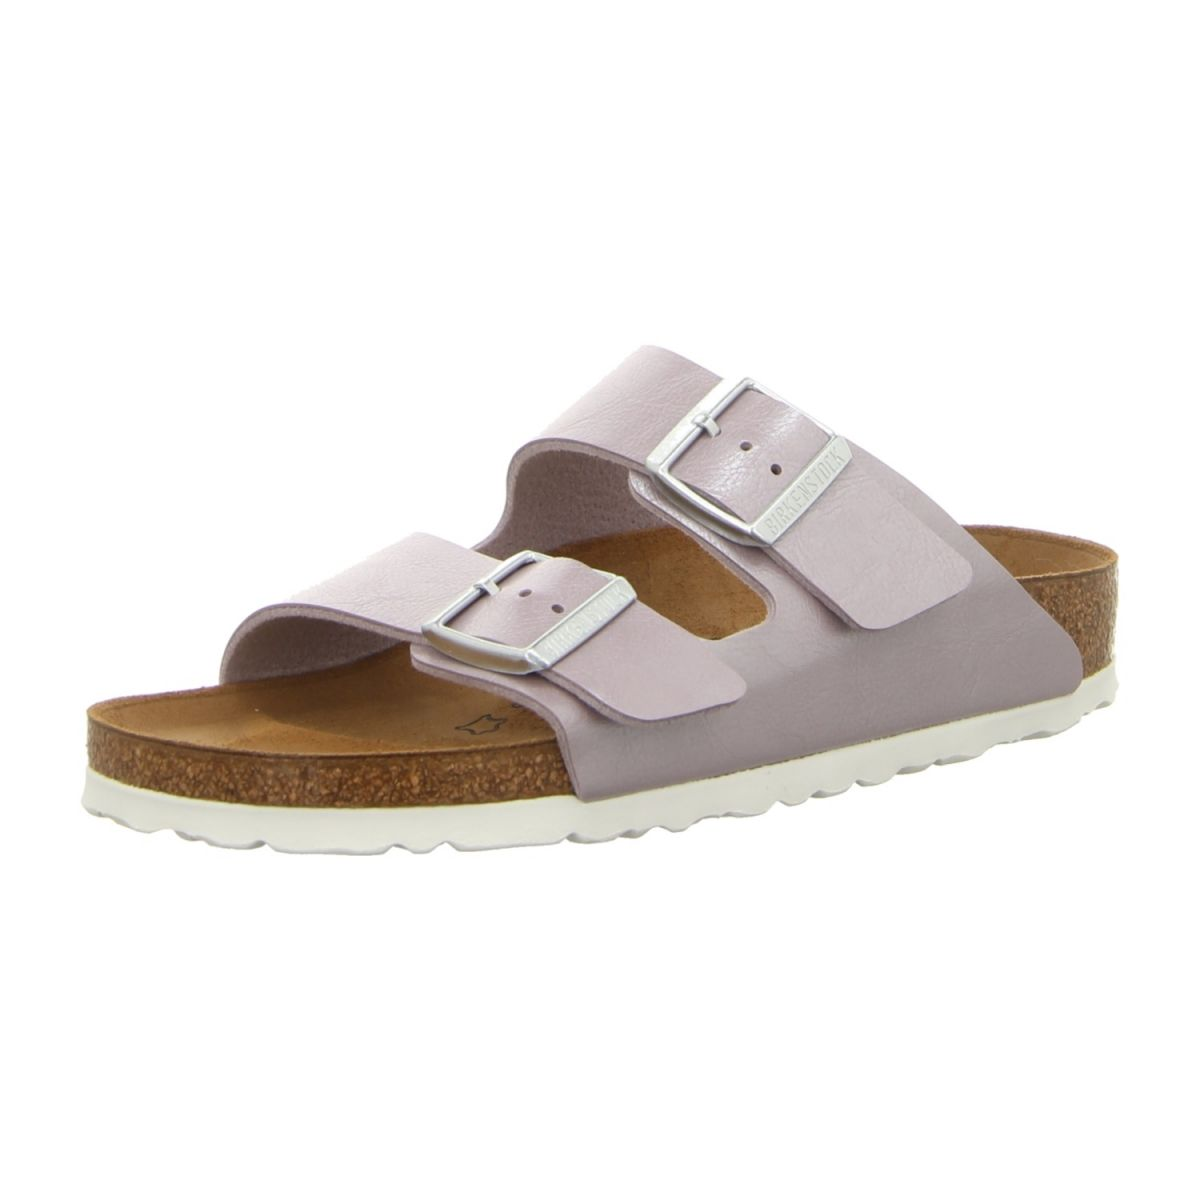 Birkenstock ARIZONA - Damen - Sandalette Pantolette - 1006373 - Damen gracefulorchid a7208e